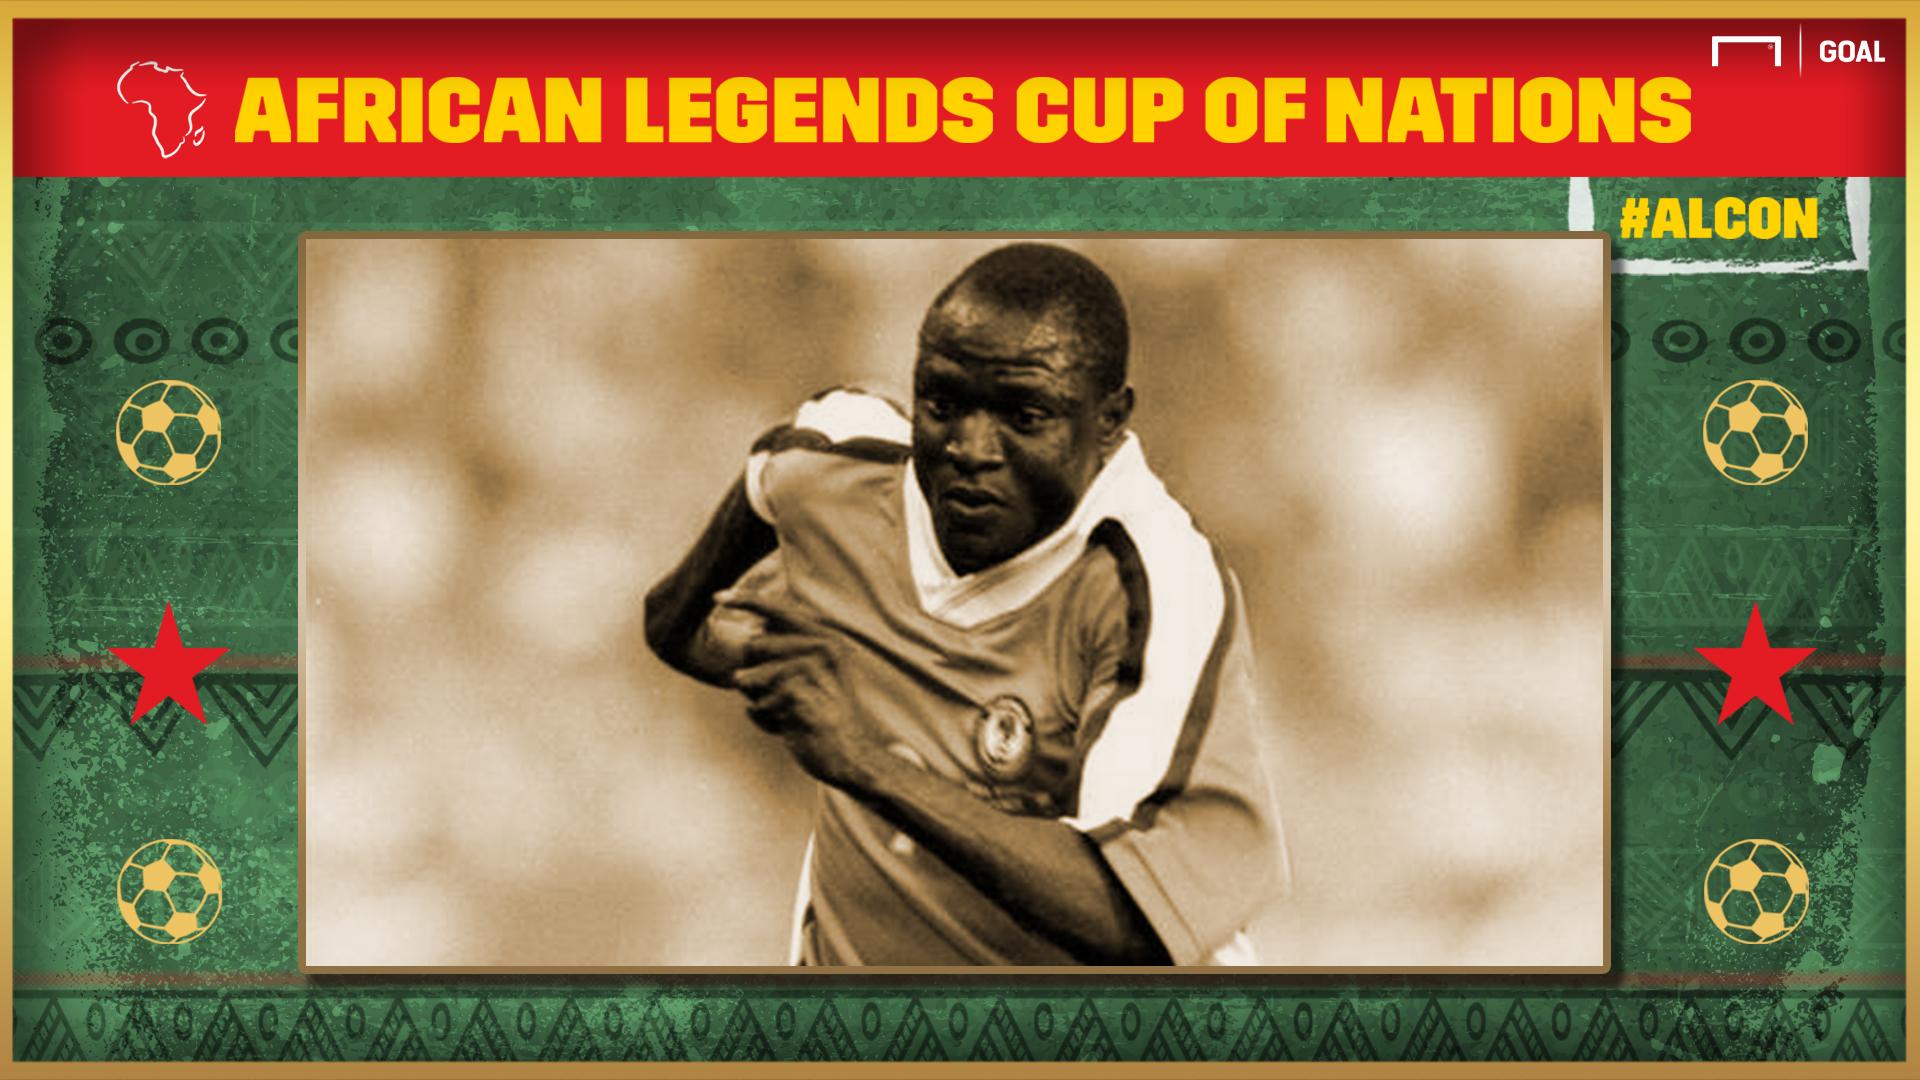 The Bull of Kaduna, Little Ronaldo, the Egyptian Messi: African football's greatest nicknames